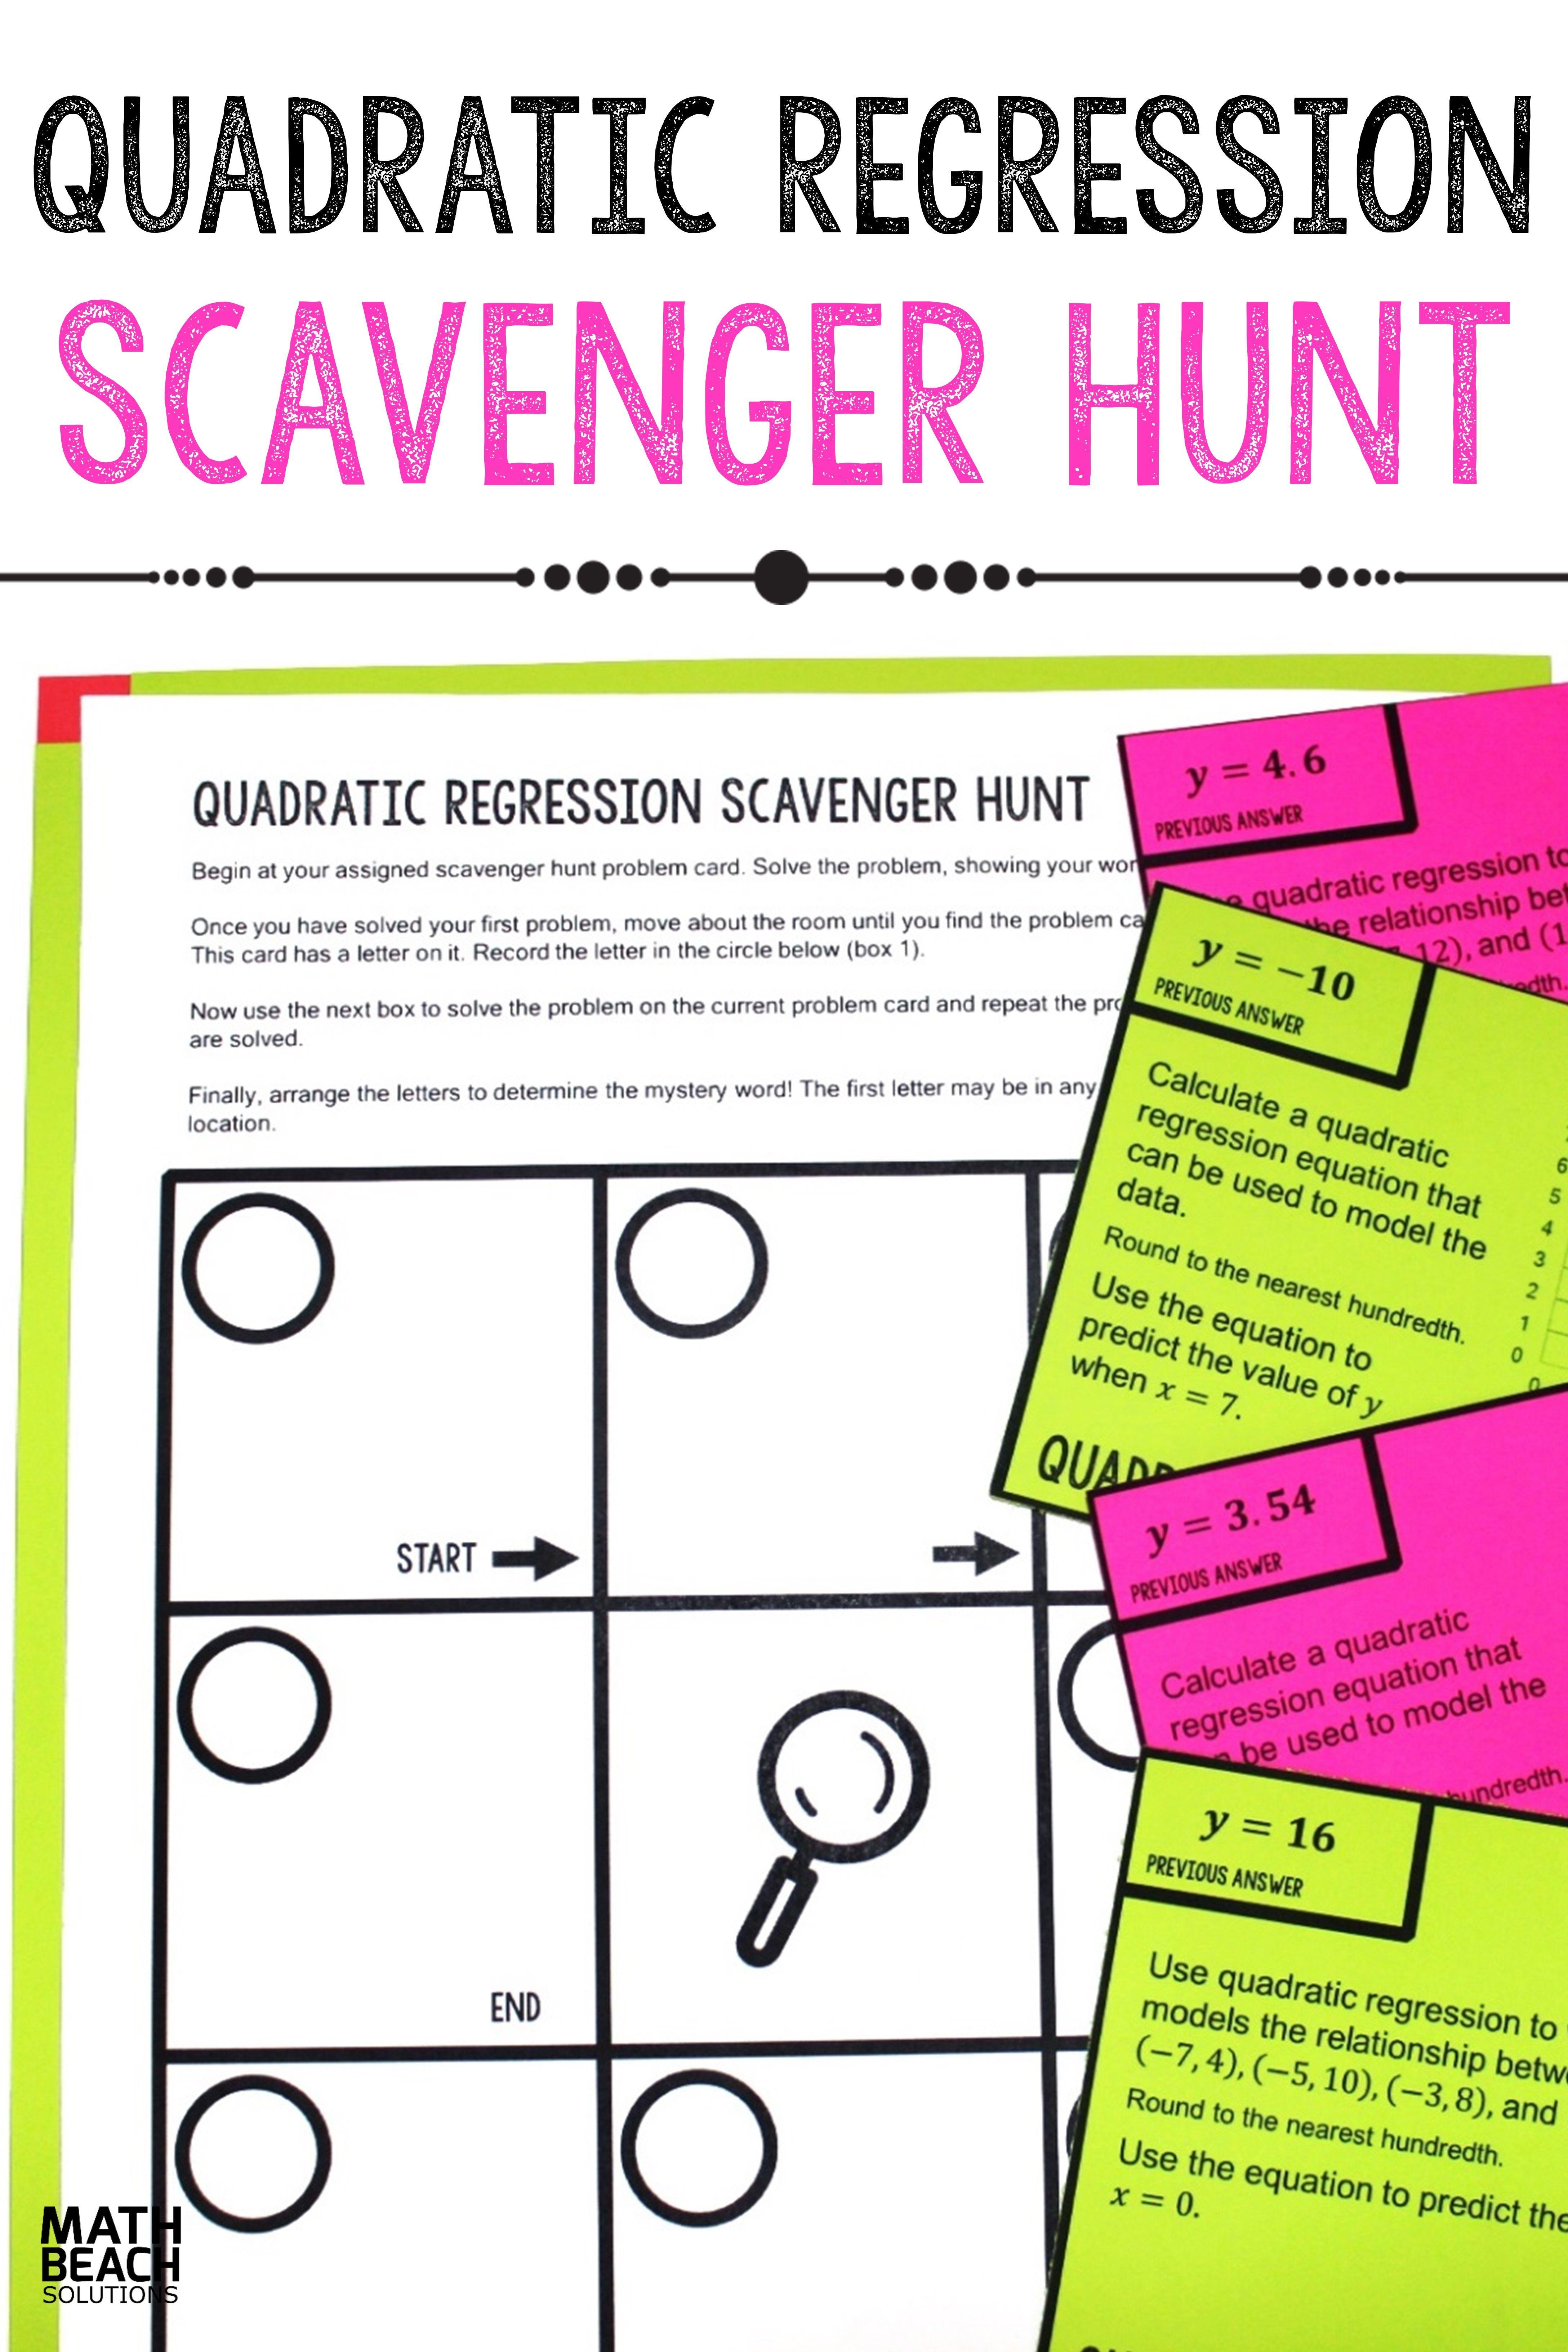 Quadratic Regression Scavenger Hunt Activity Quadratics Free Math Worksheets Algebra Worksheets [ 6528 x 4352 Pixel ]